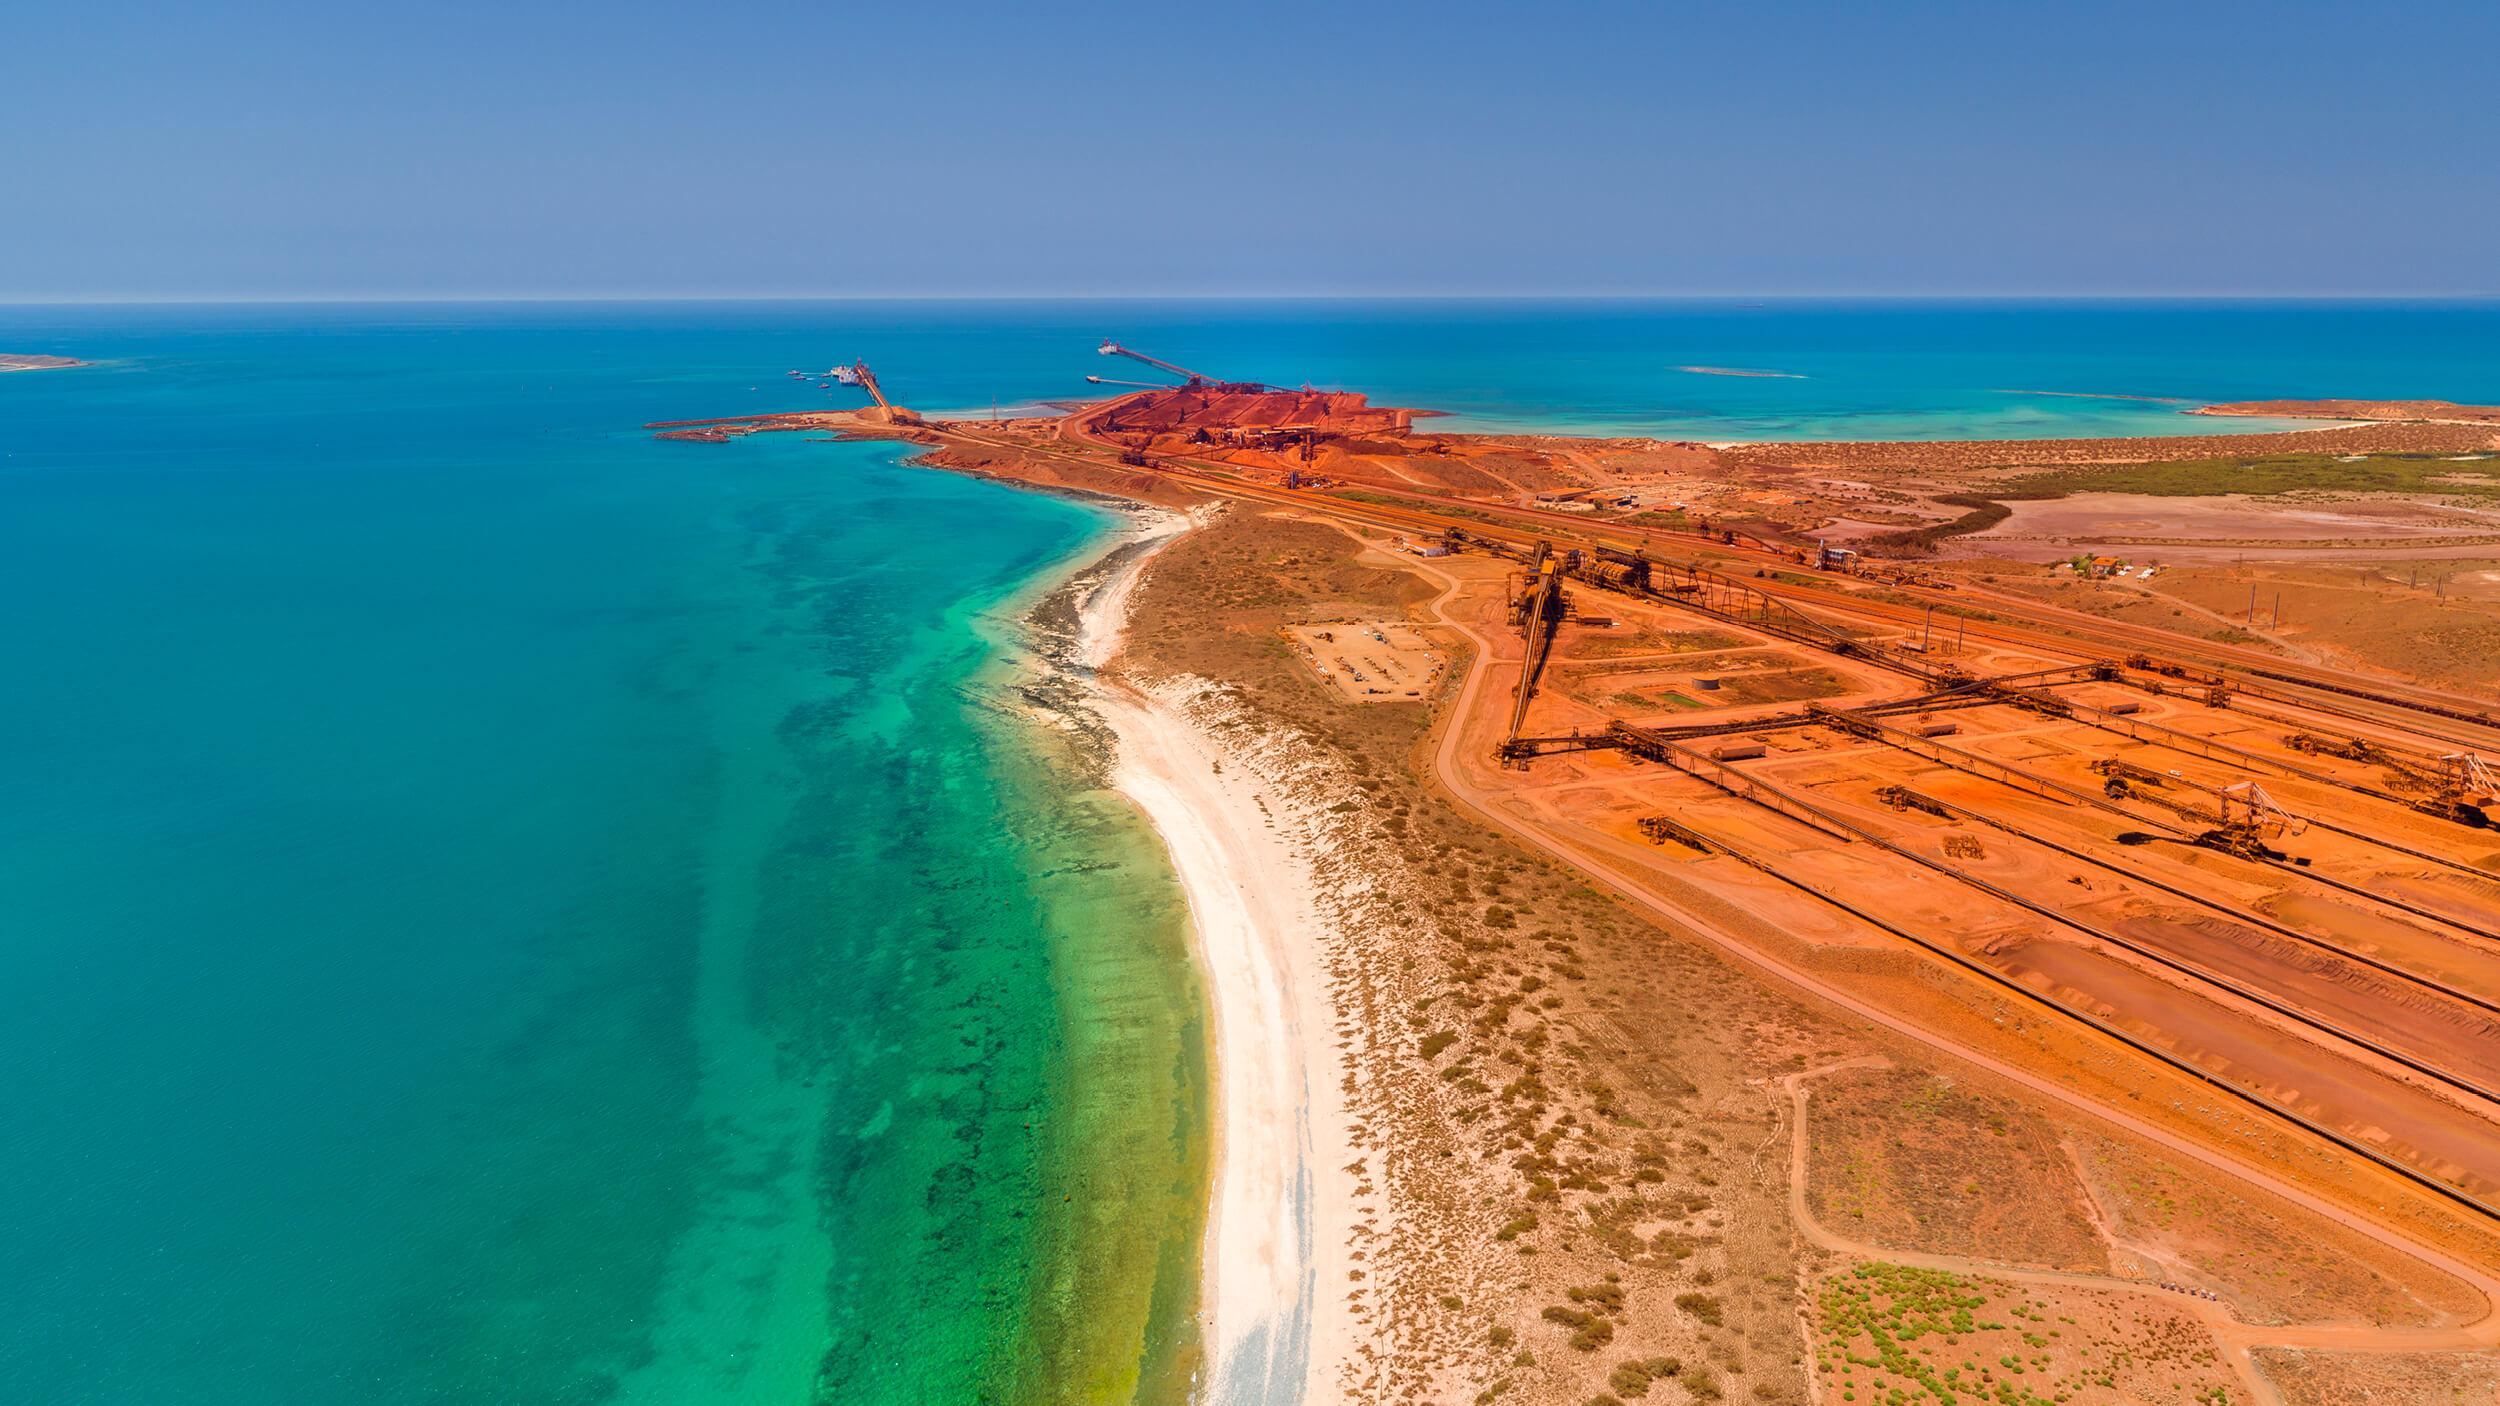 Pilbara Resources Tour - Cape Lambert